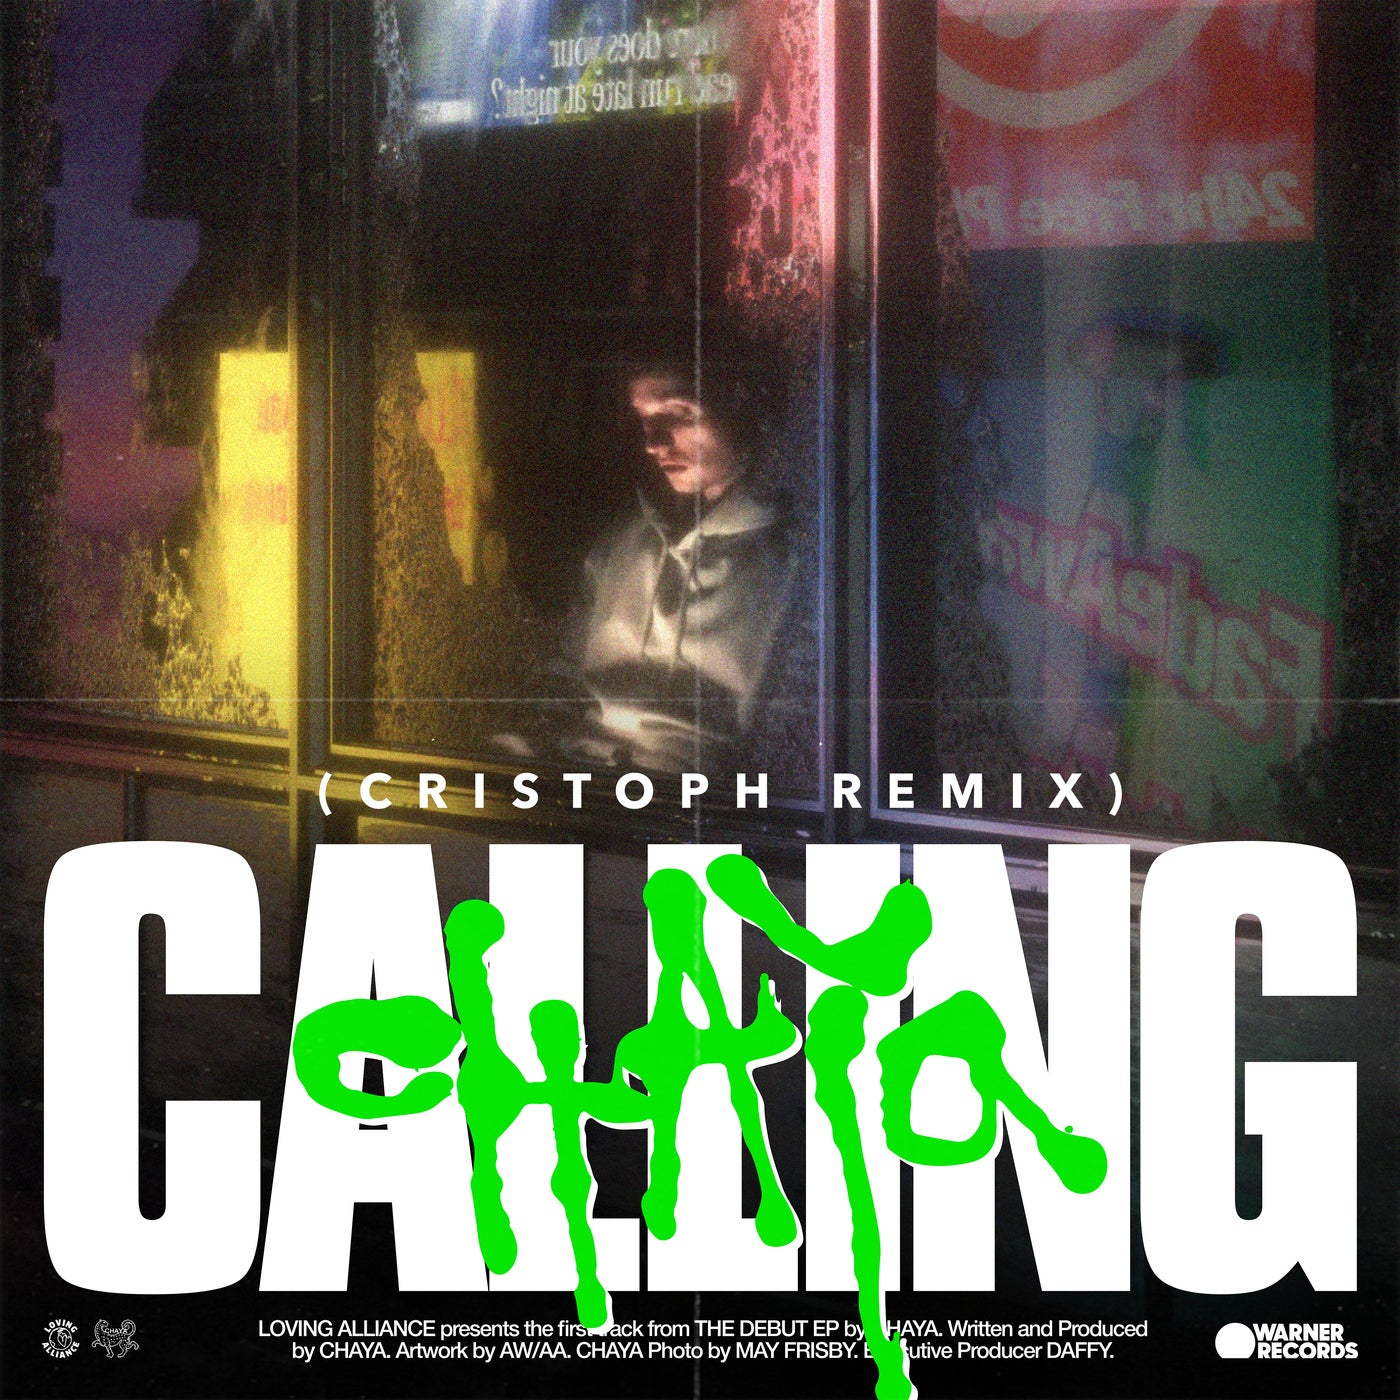 Calling (Cristoph Remix)